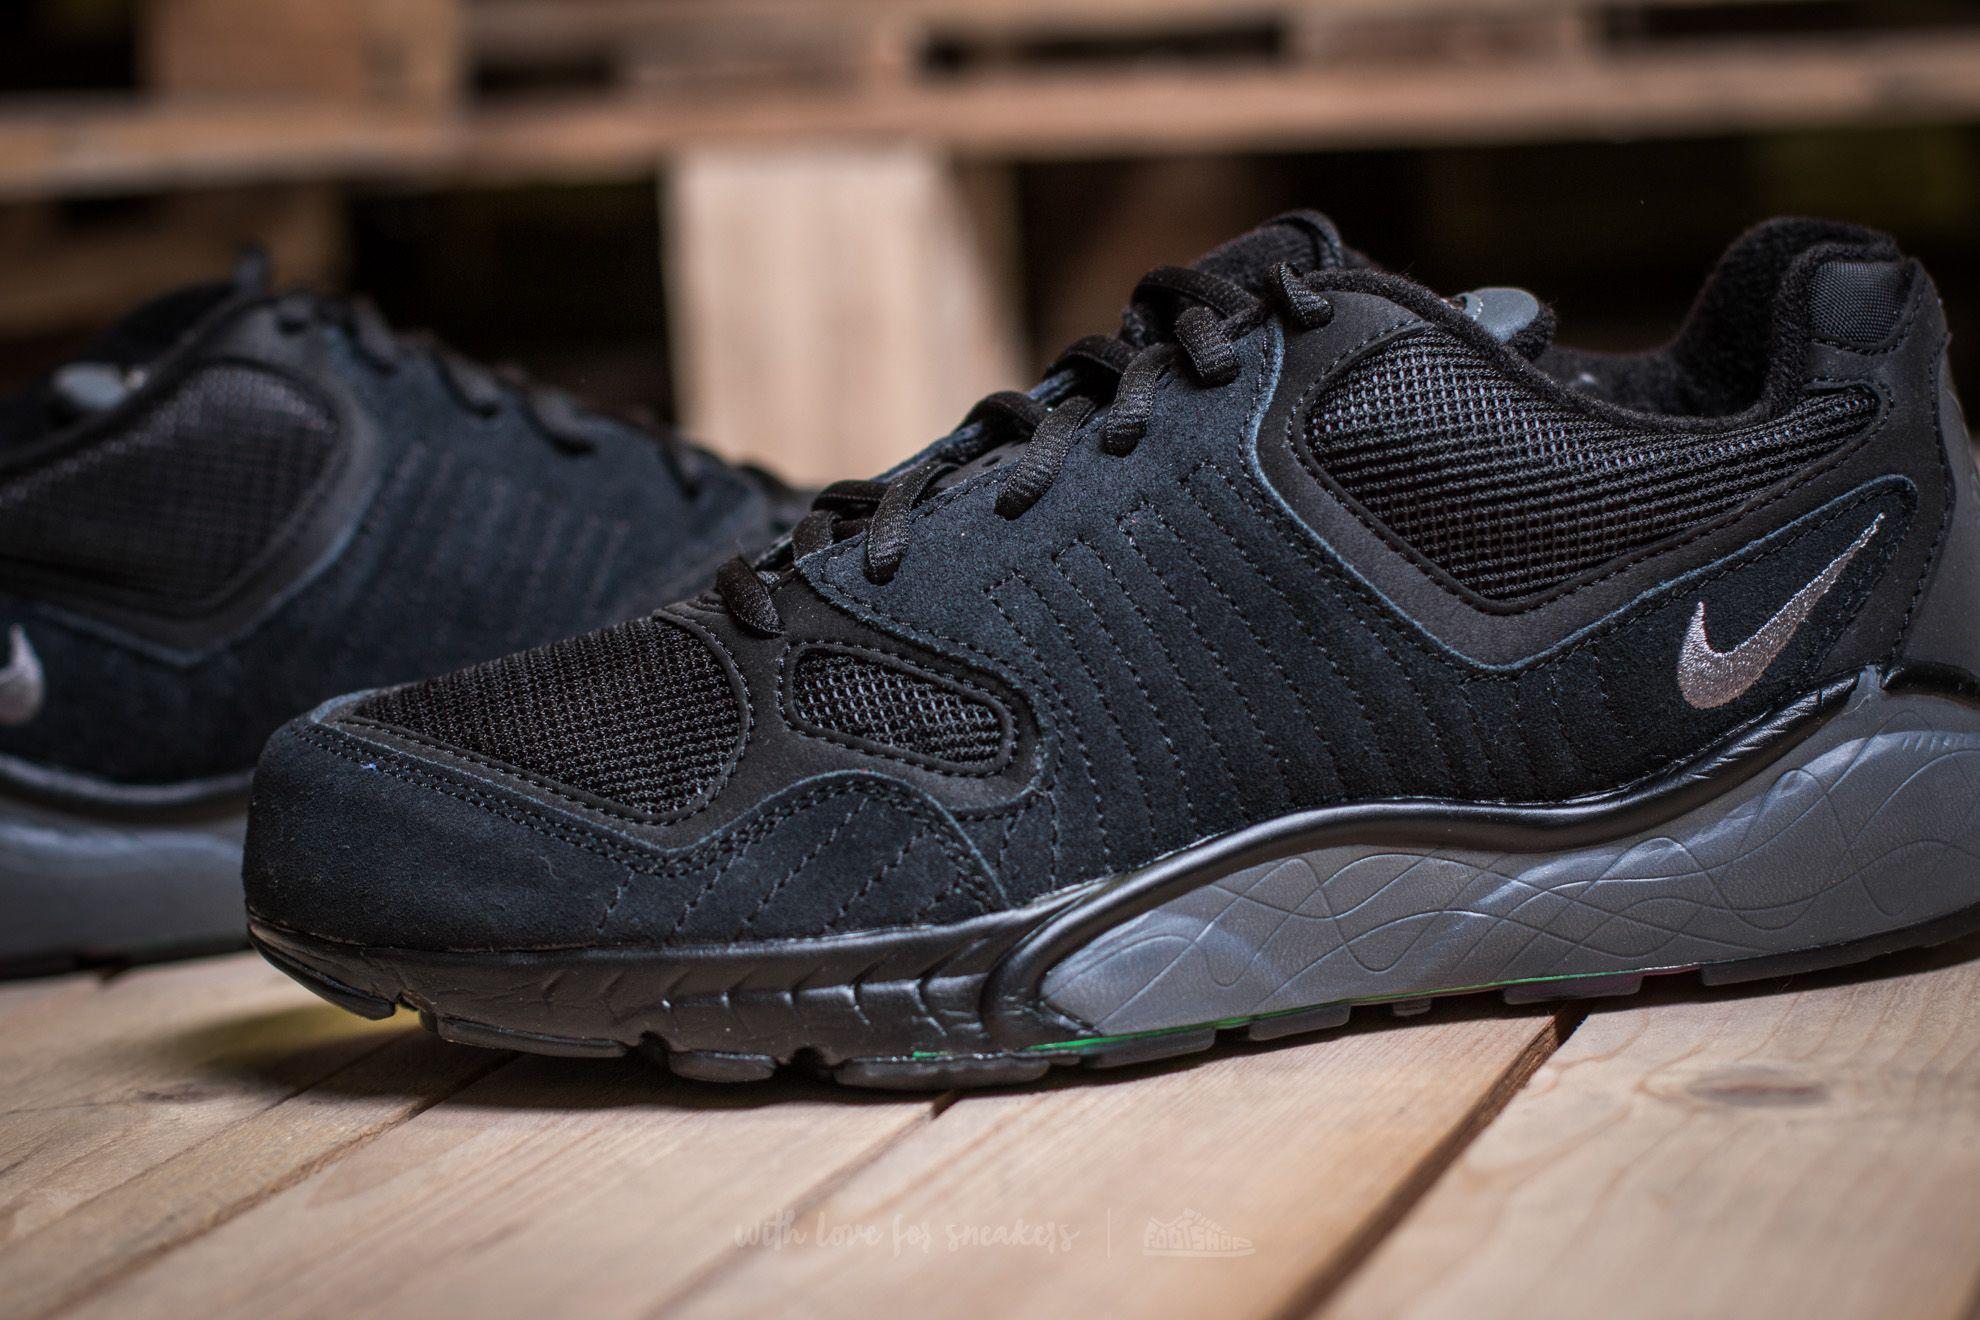 8476b4b2941 Lyst - Nike Air Zoom Talaria  16 Black  Dark Grey-black-white in ...